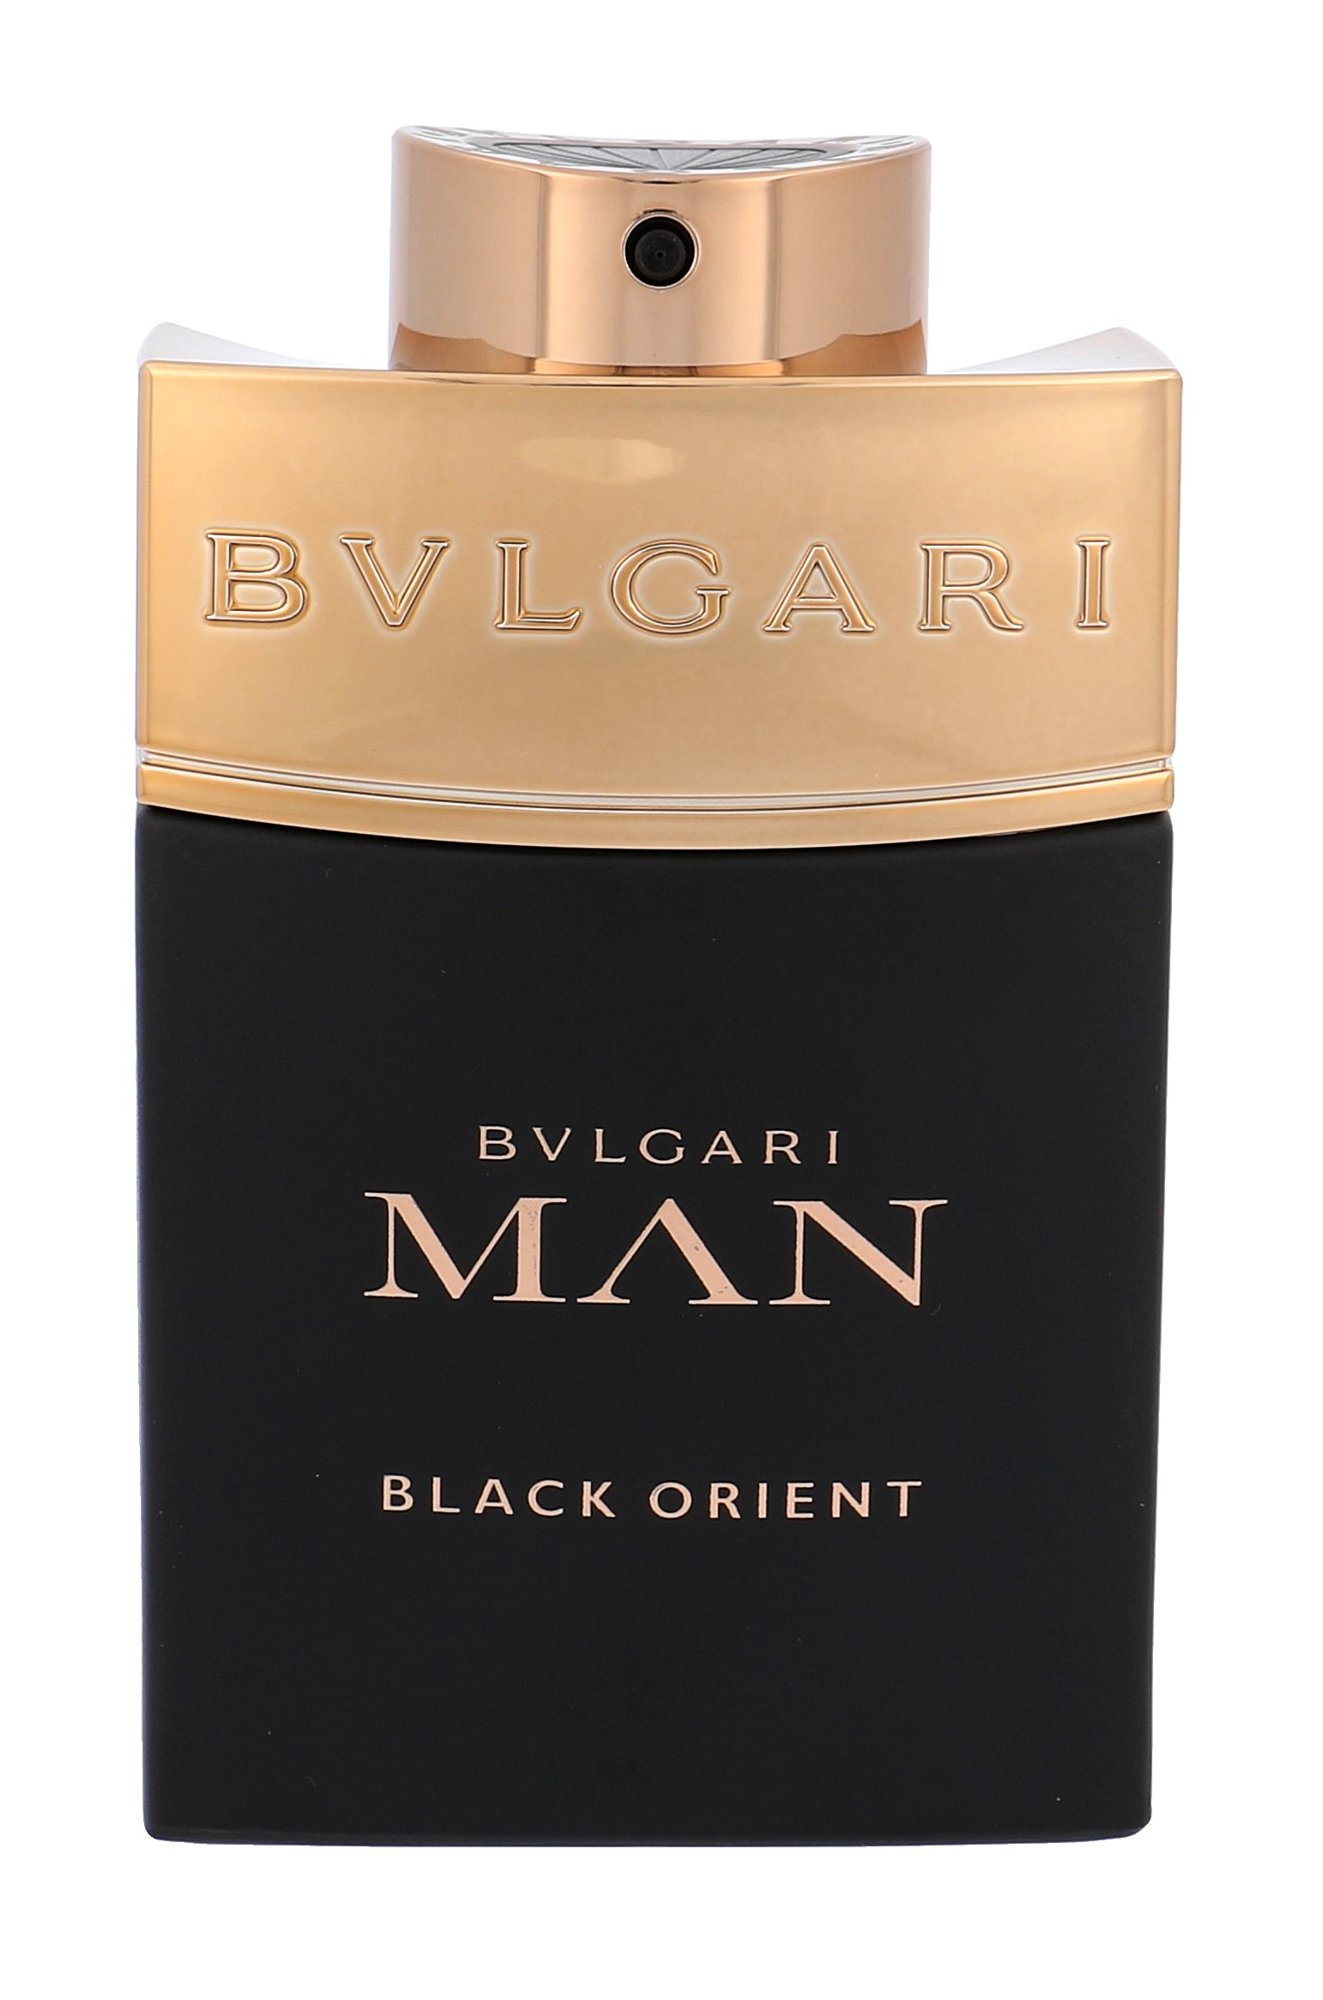 Bvlgari Man Black Orient Perfume 60ml